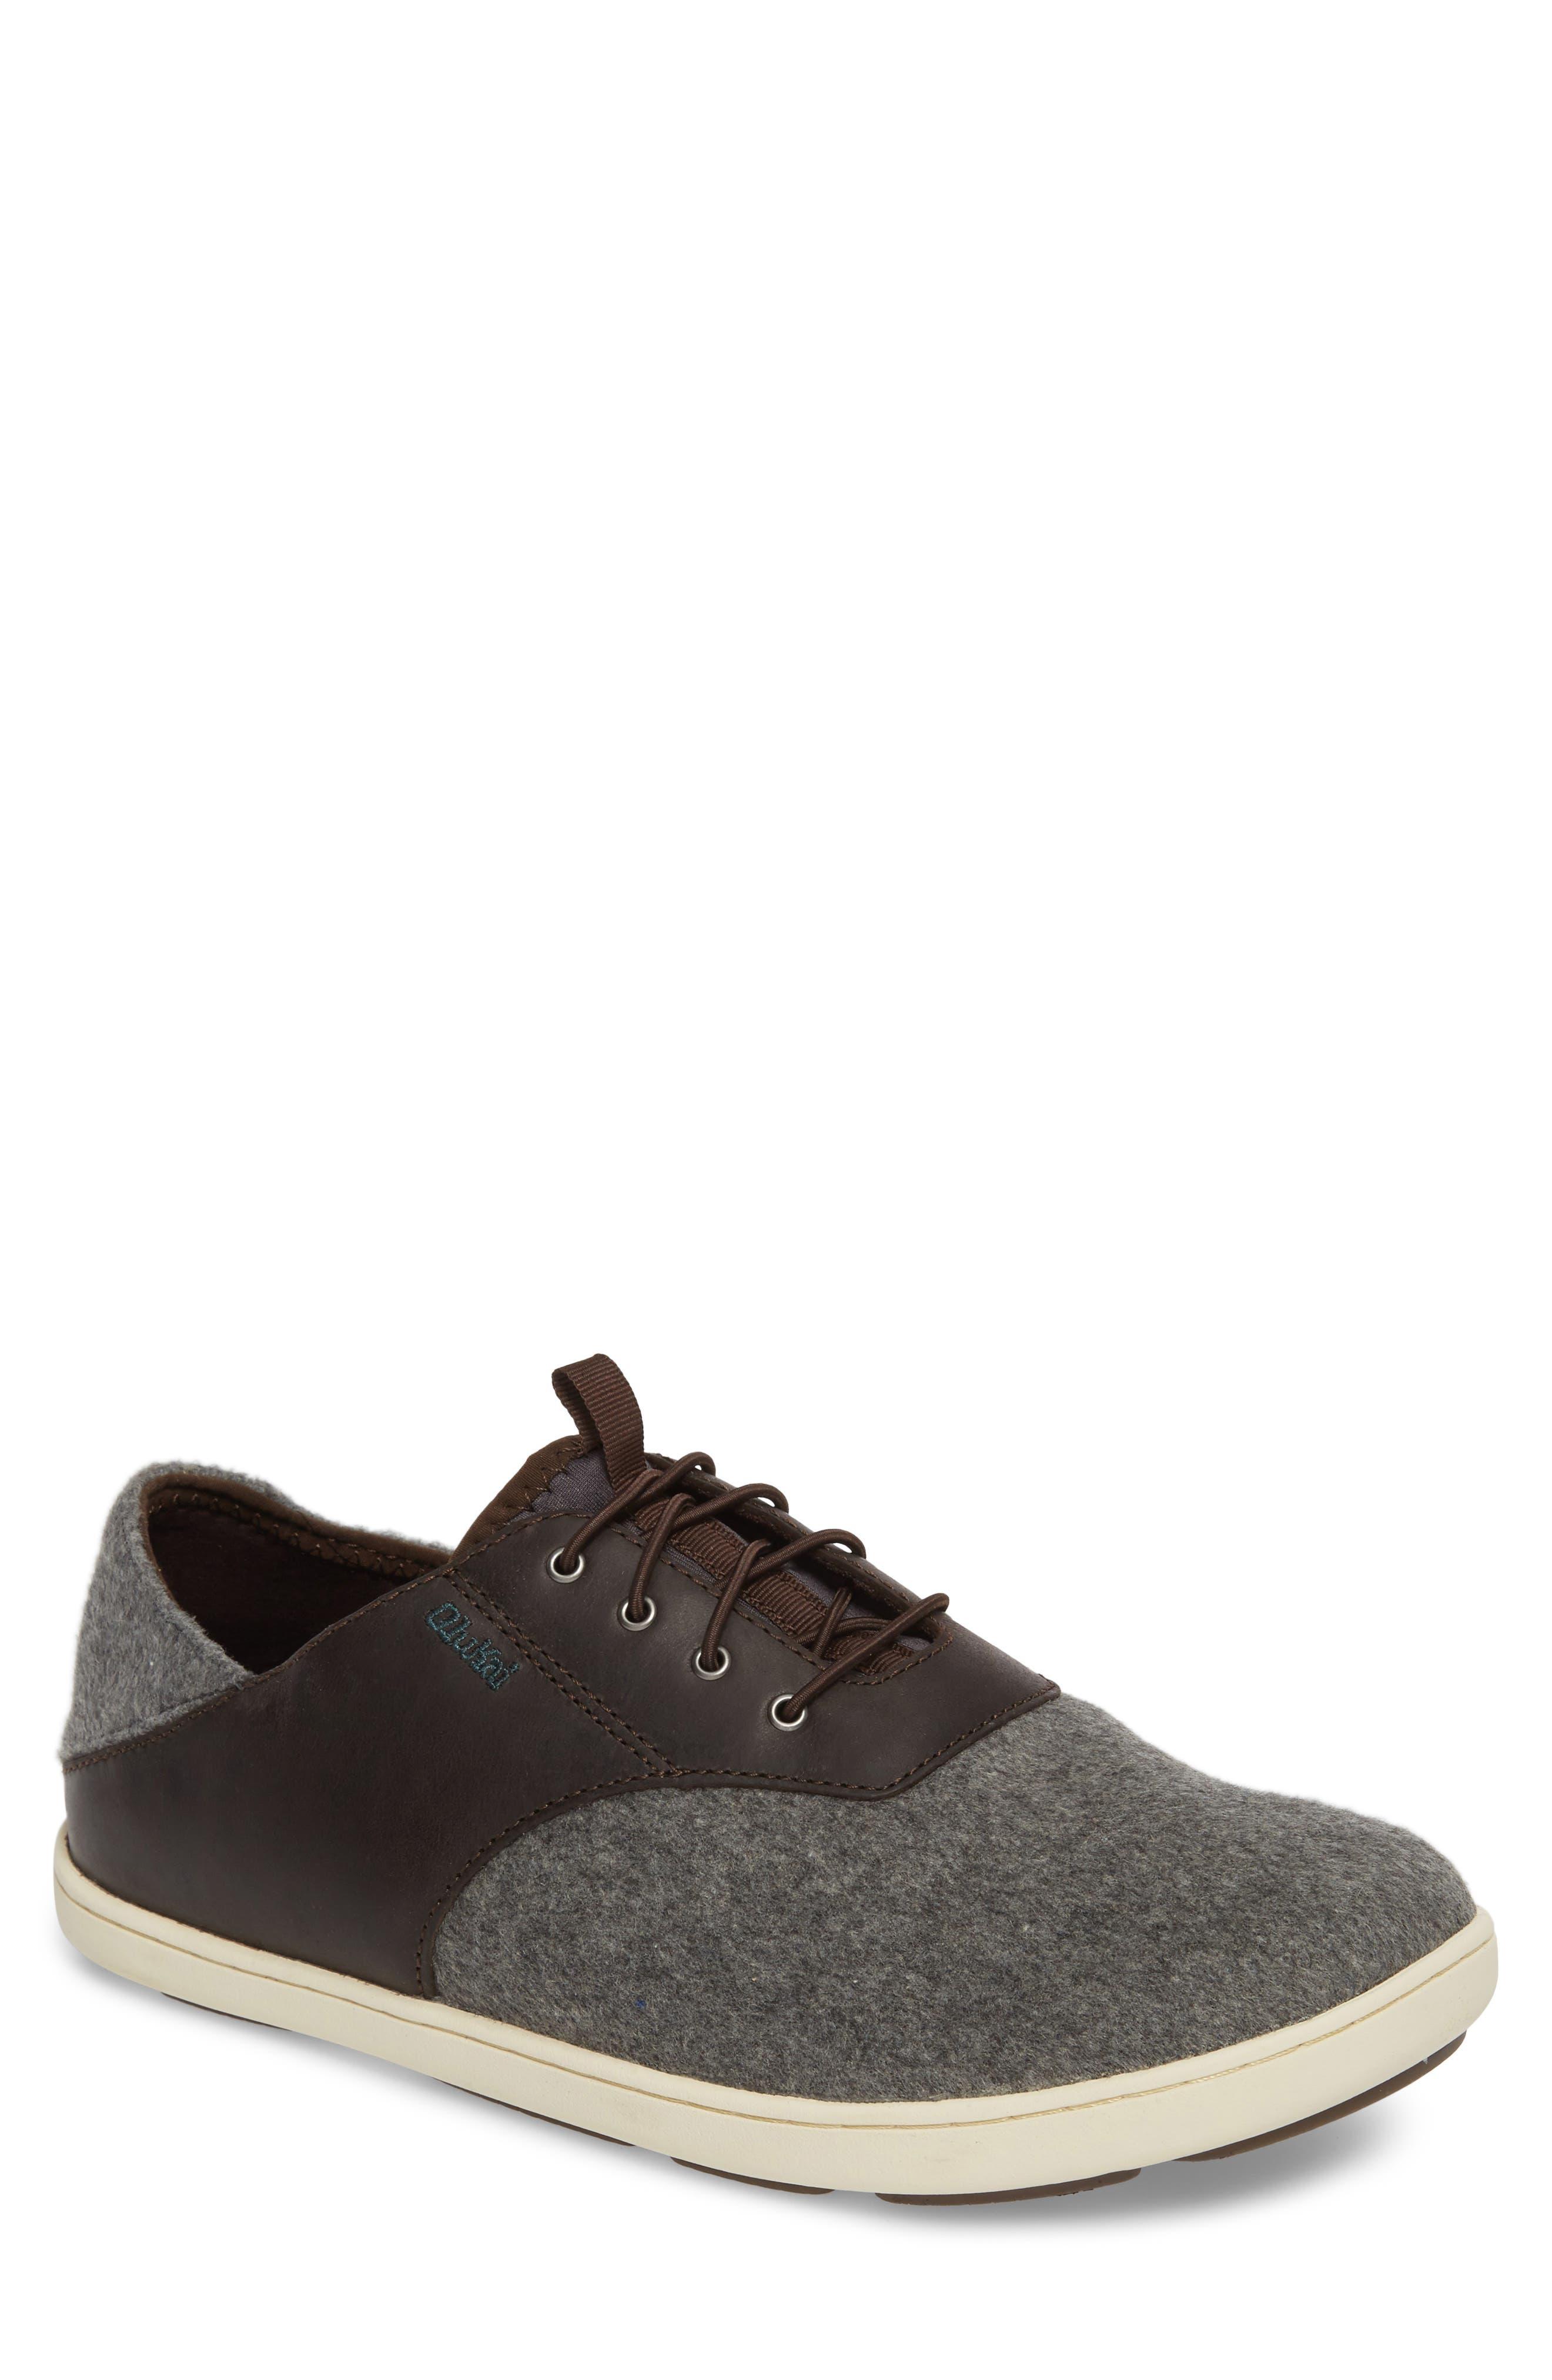 Nohea Moku Hulu Sneaker,                             Main thumbnail 1, color,                             Dark Roast/ Charcoal Wool